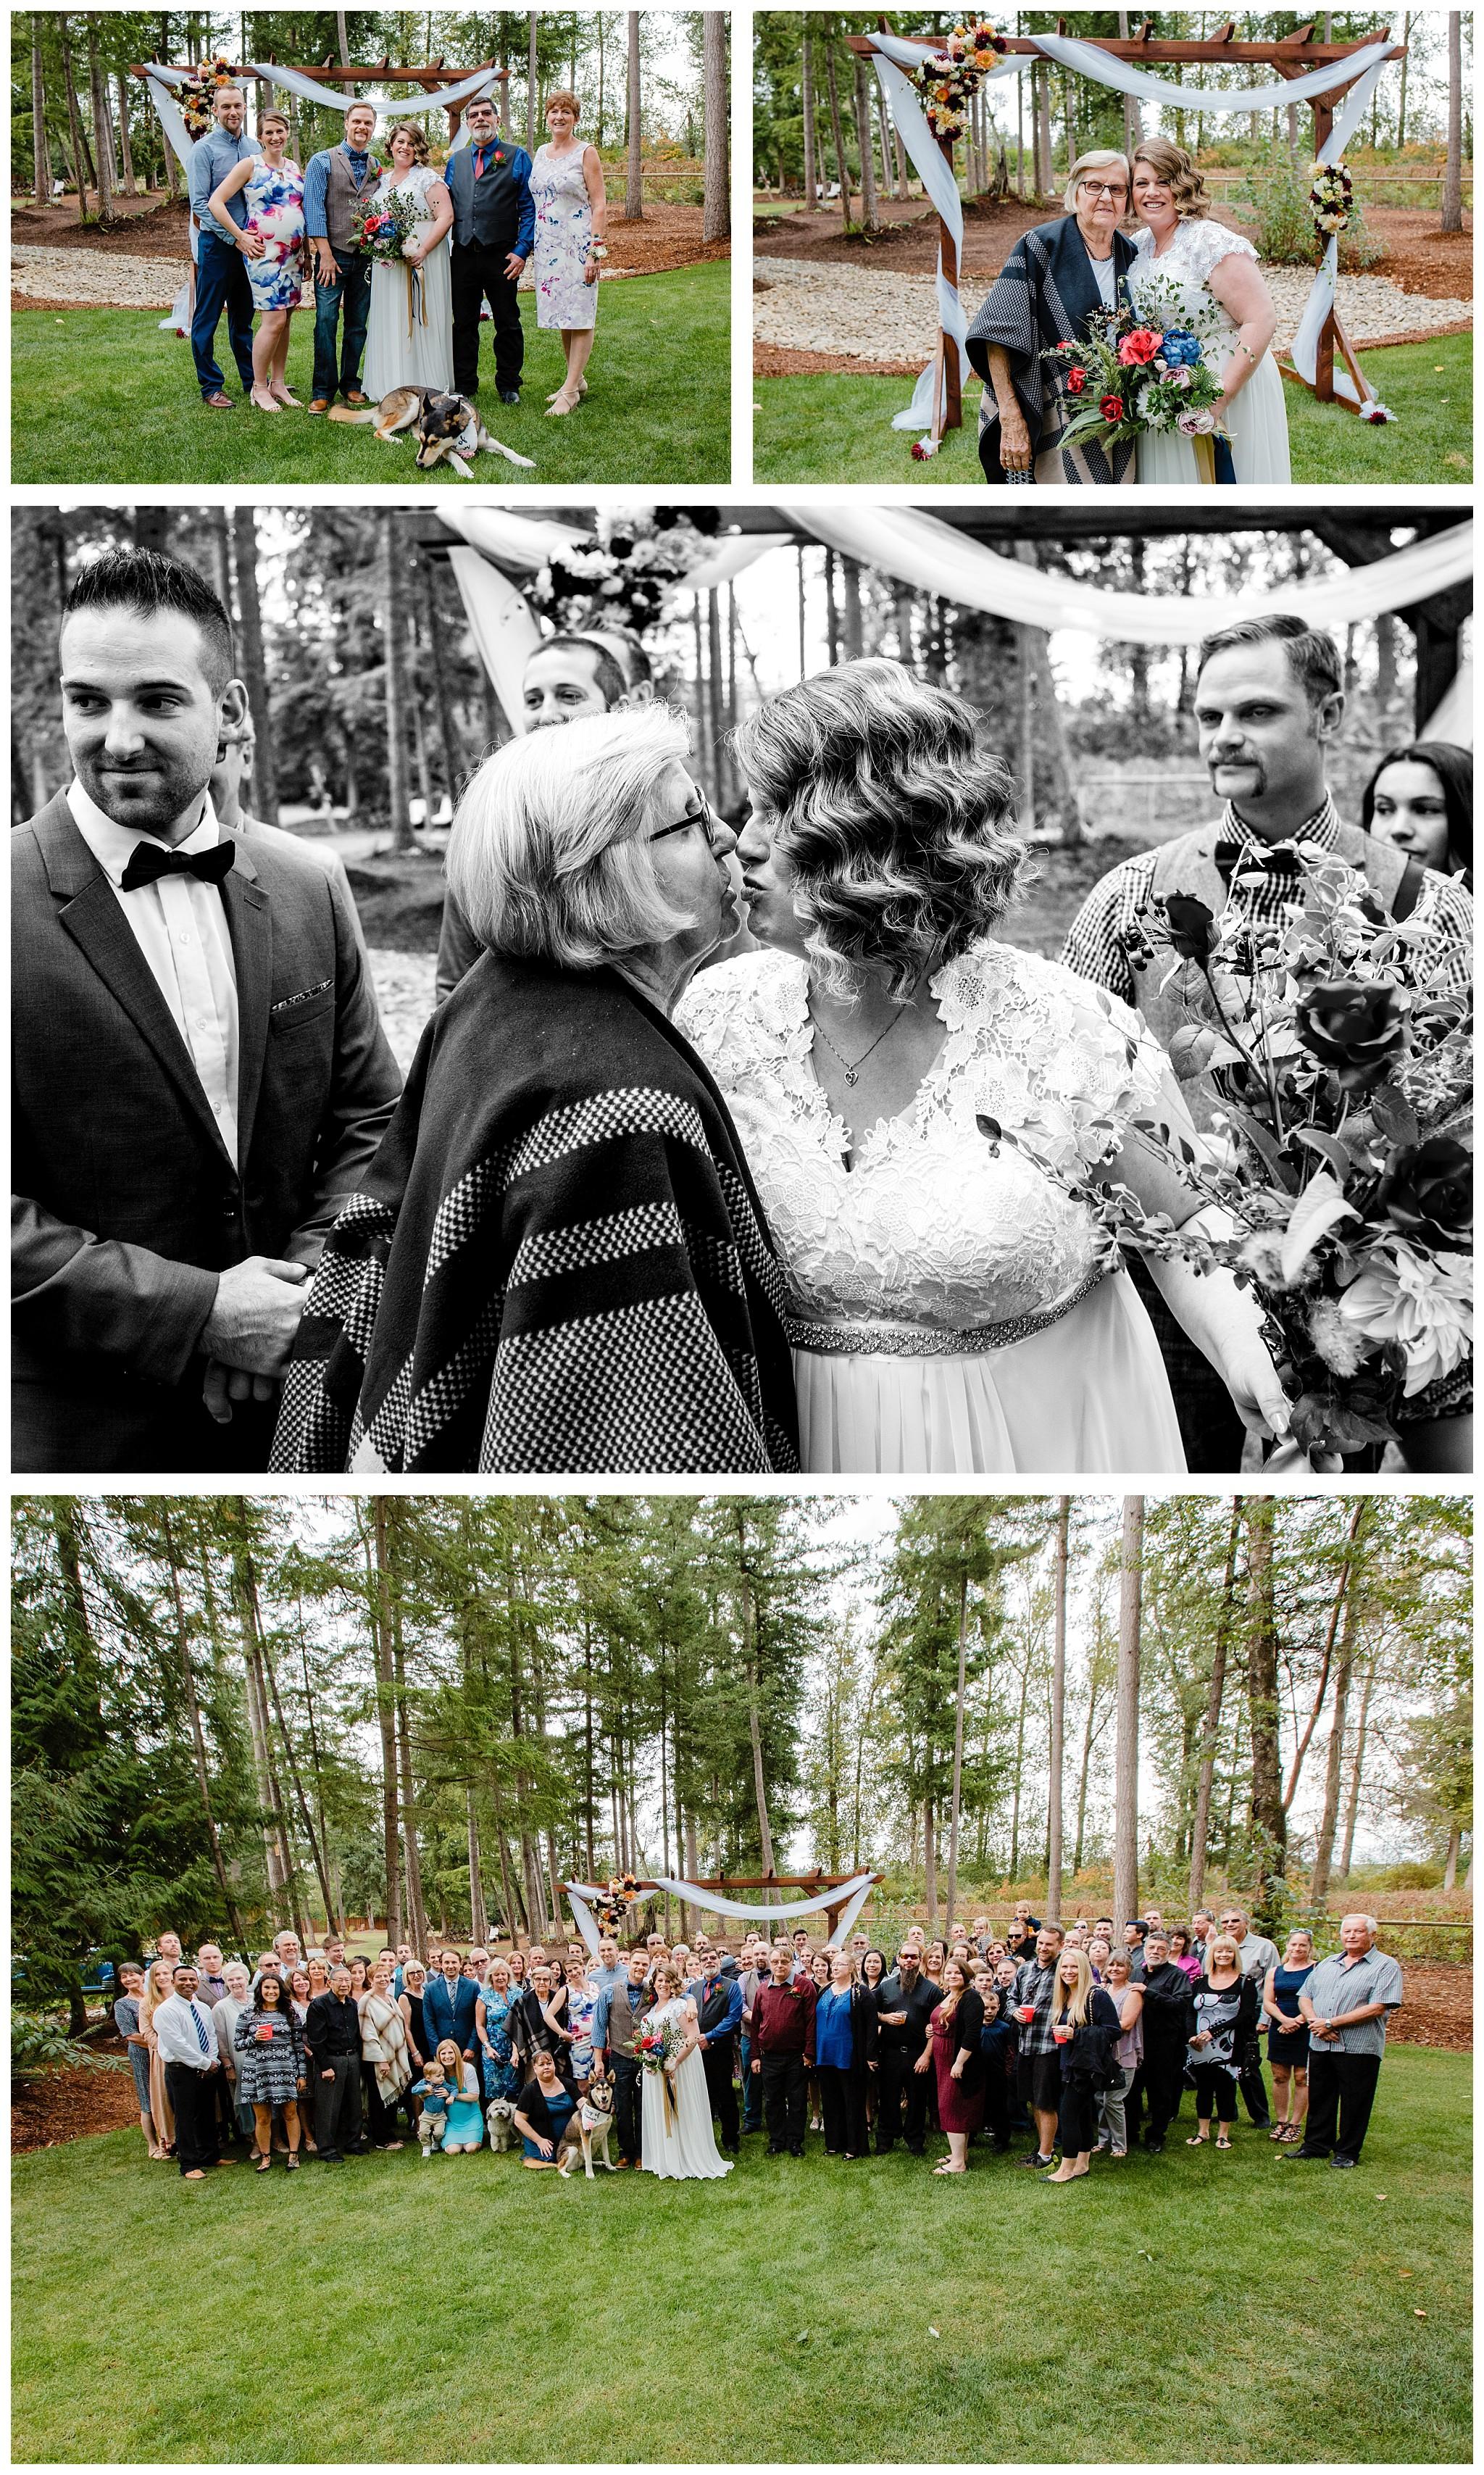 Aldergrove Park Fall Backyard Wedding Photographer Pregnant Bride Tent Outdoor BC Canada Best Wedding Photographer_0040.jpg